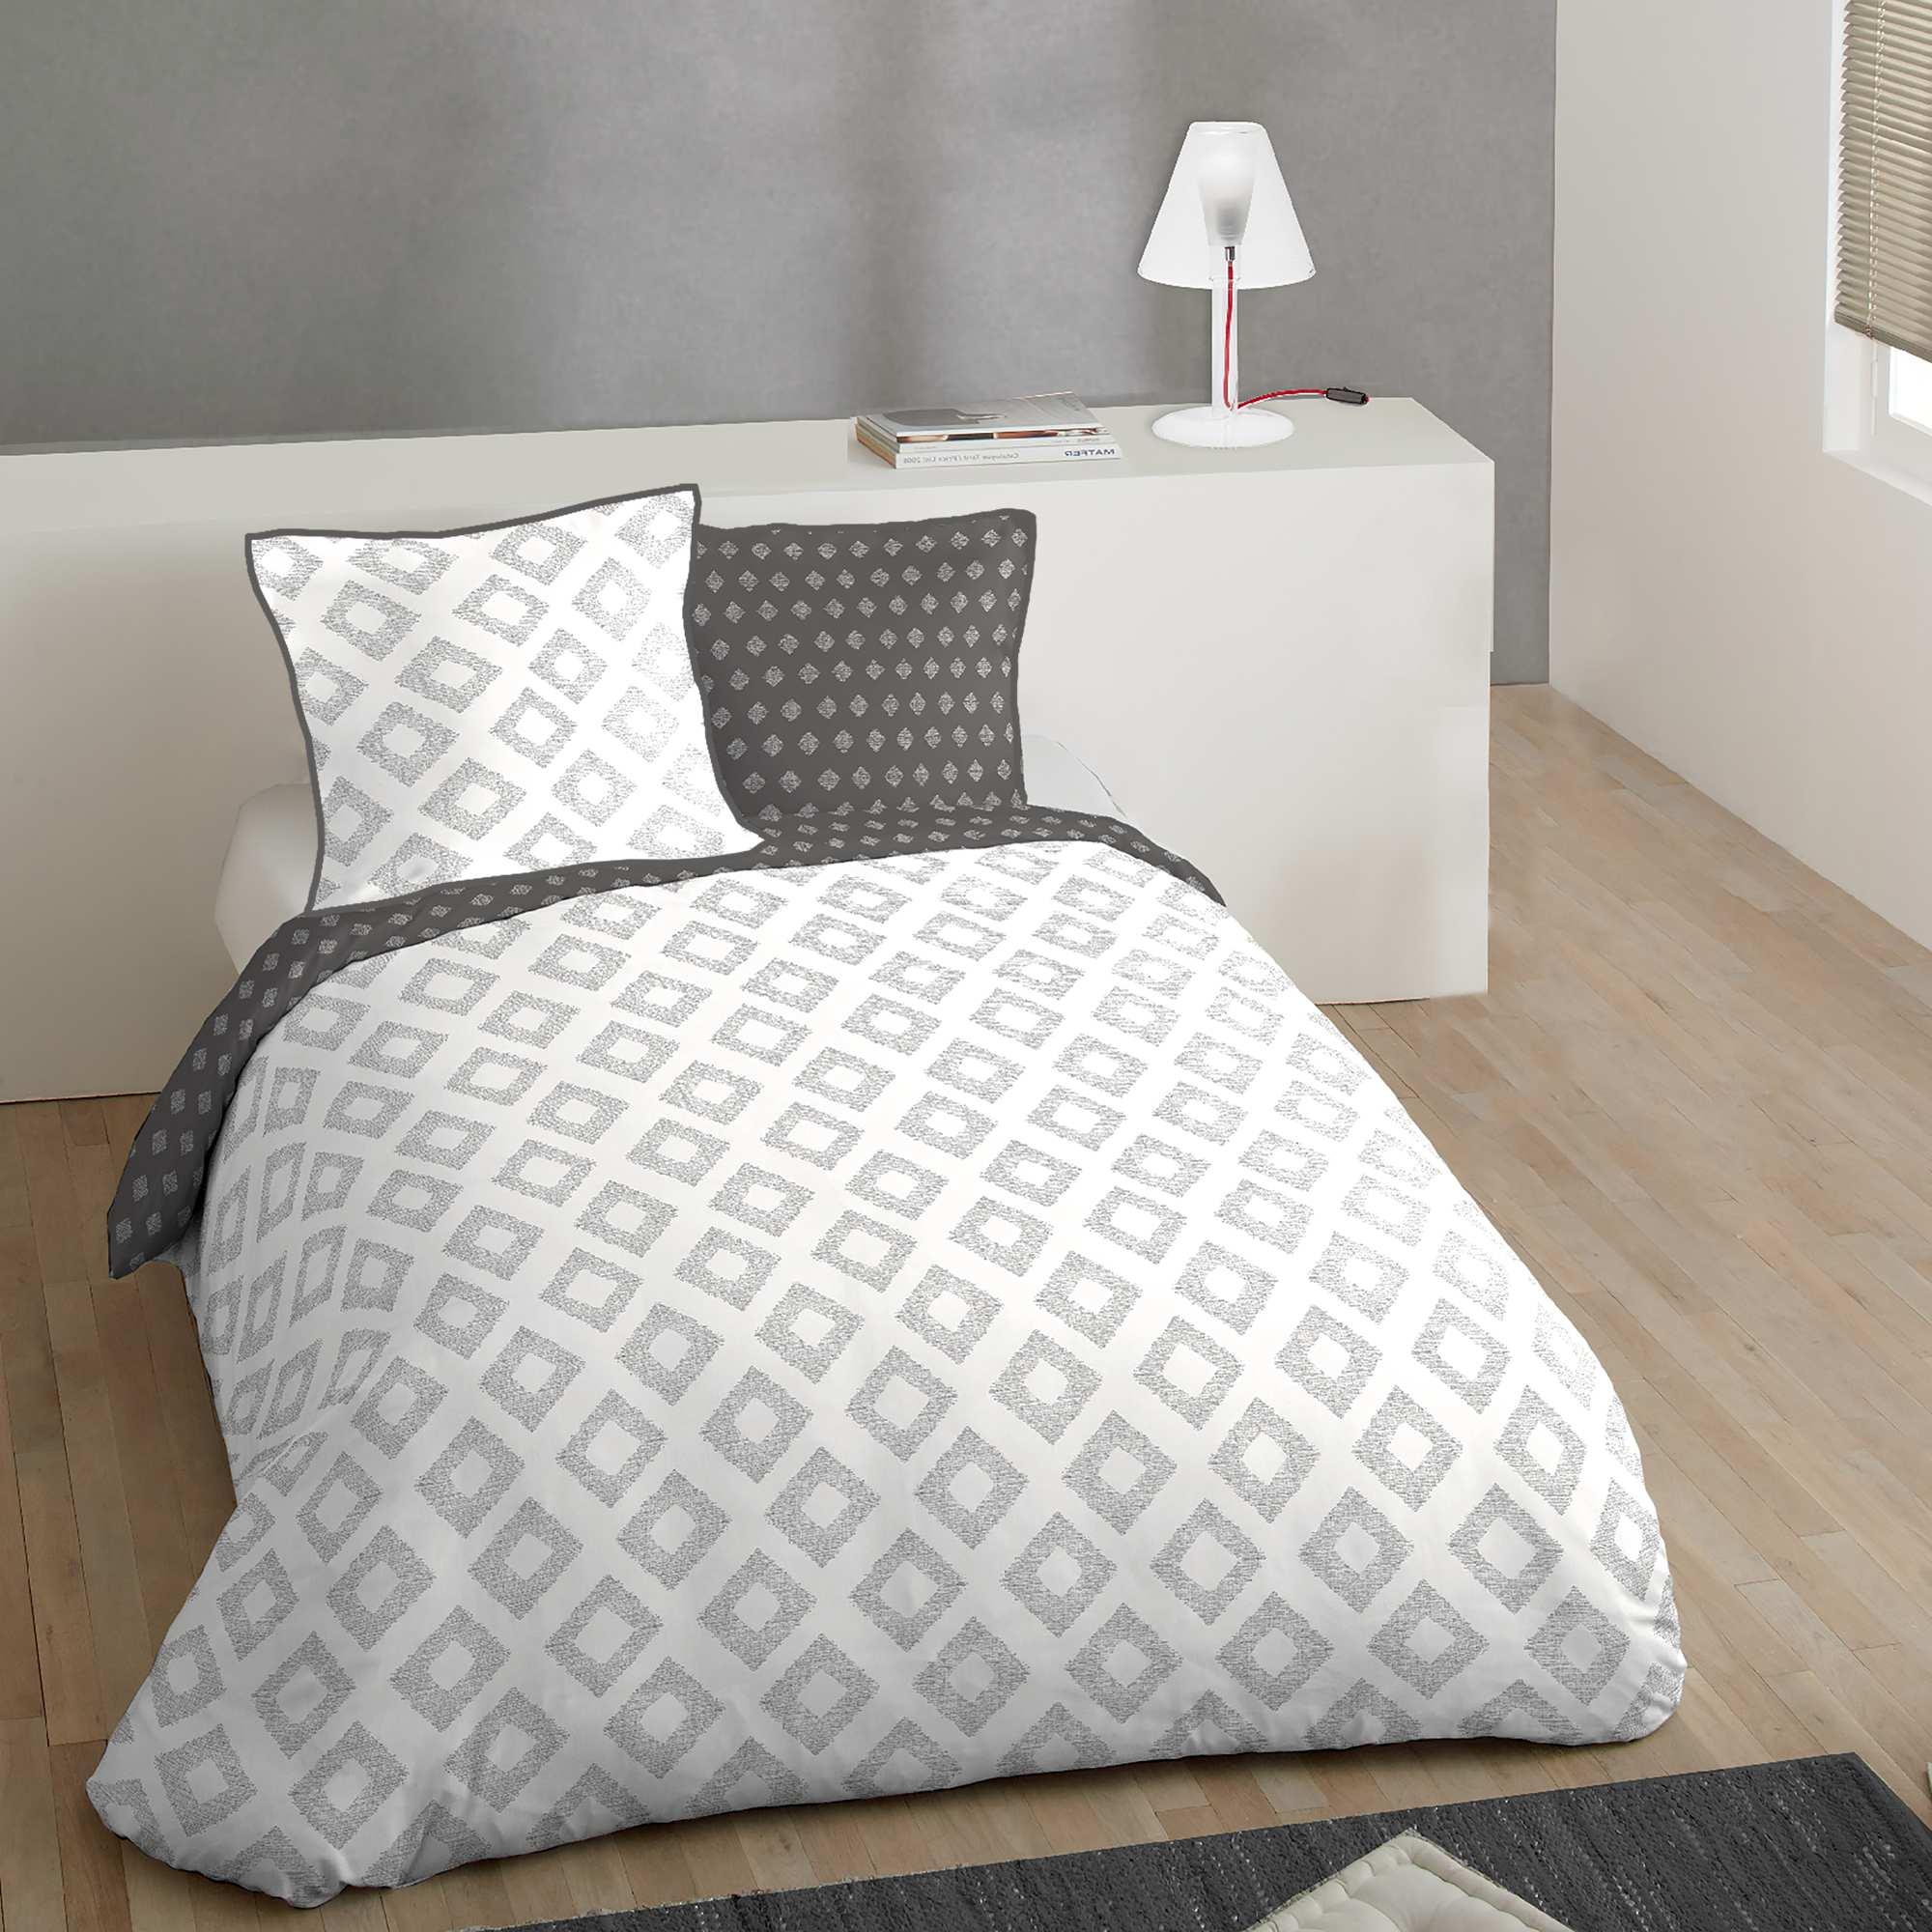 Juego de cama doble de algod n hogar blanco gris kiabi for Cama doble nina